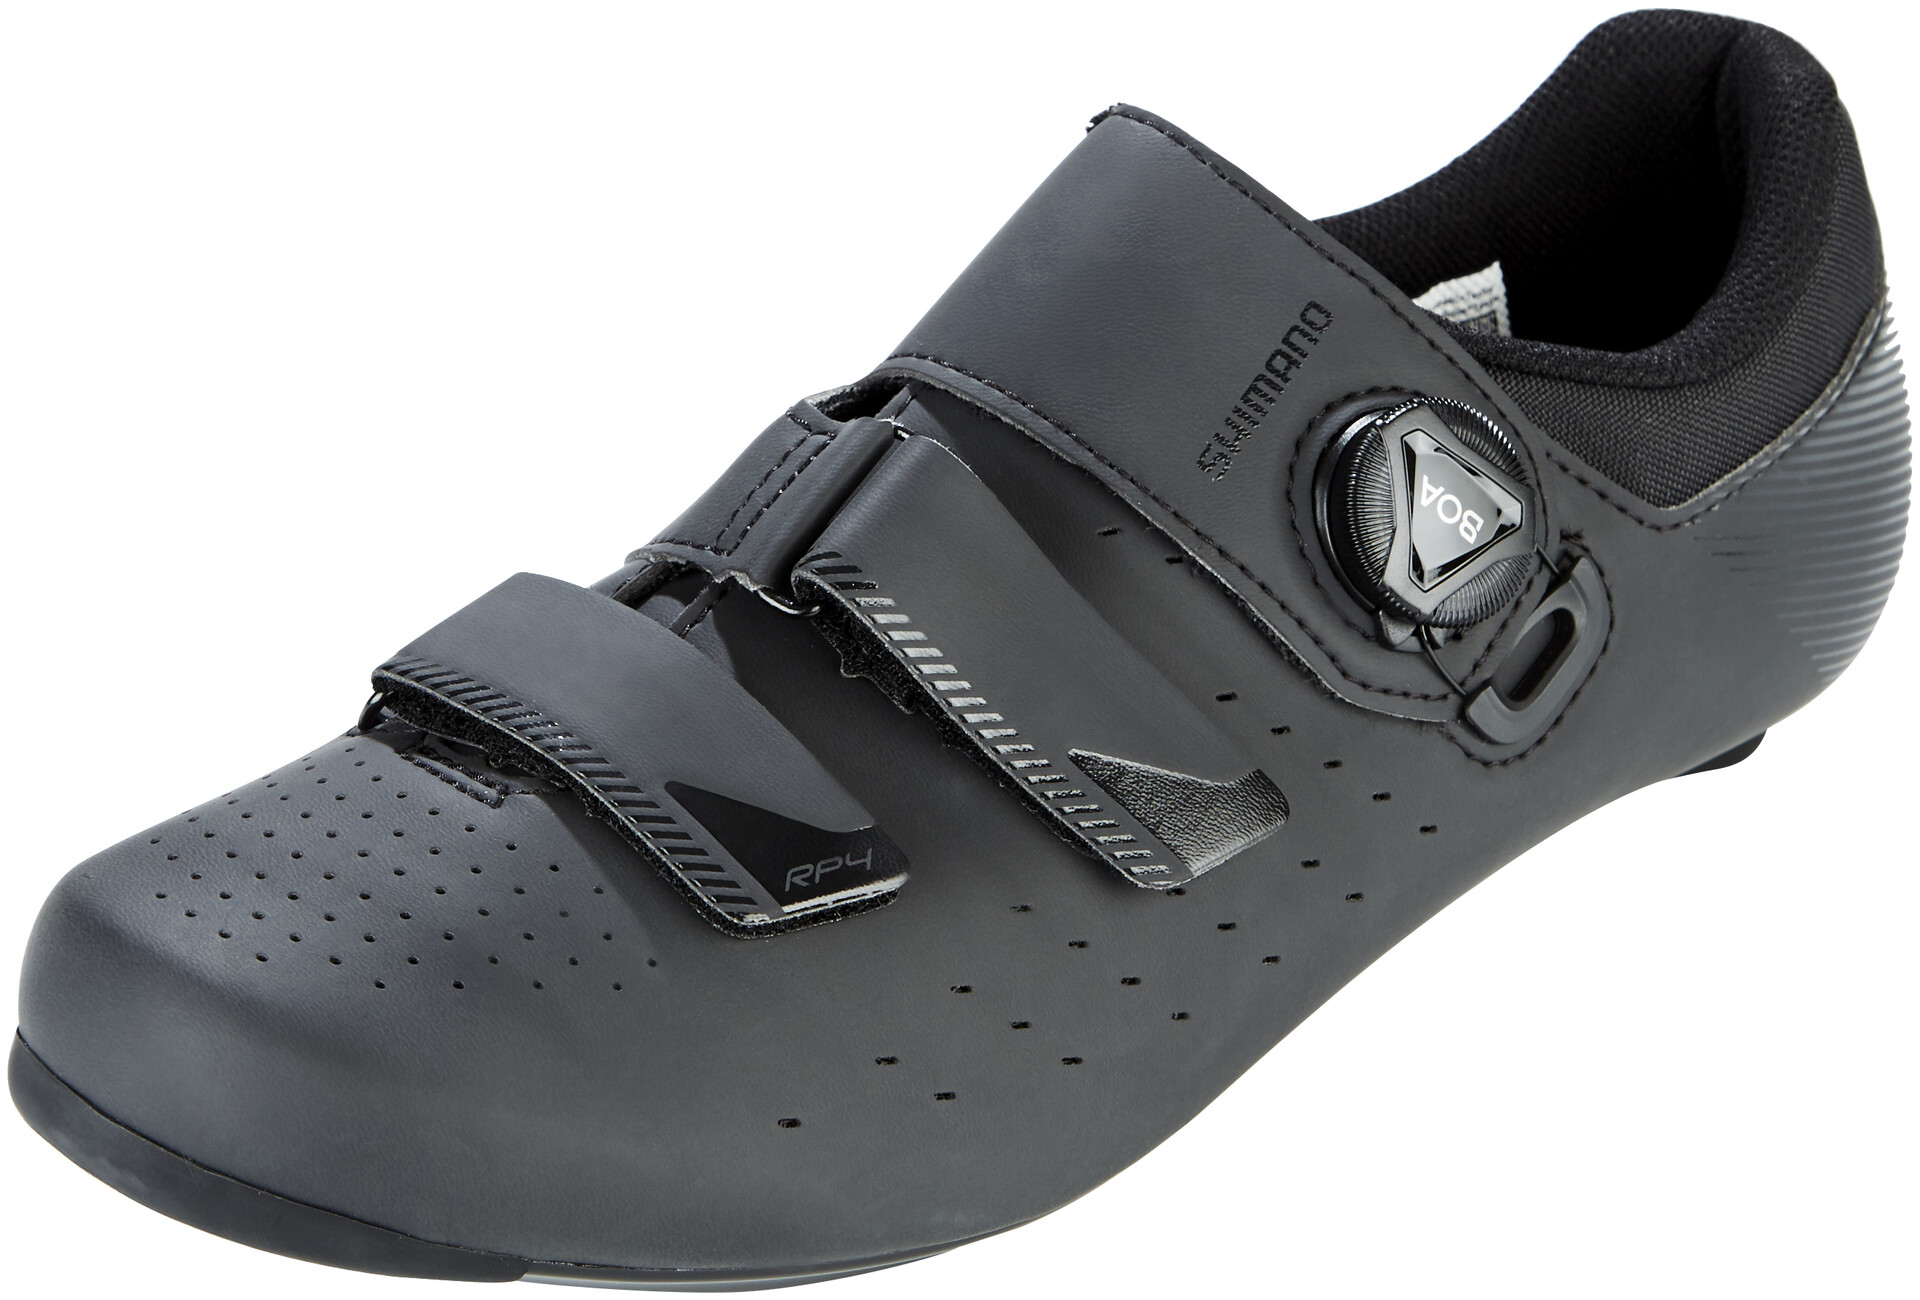 Nye Adidas Cosmic 2 W Rød Løbesko Dame Online